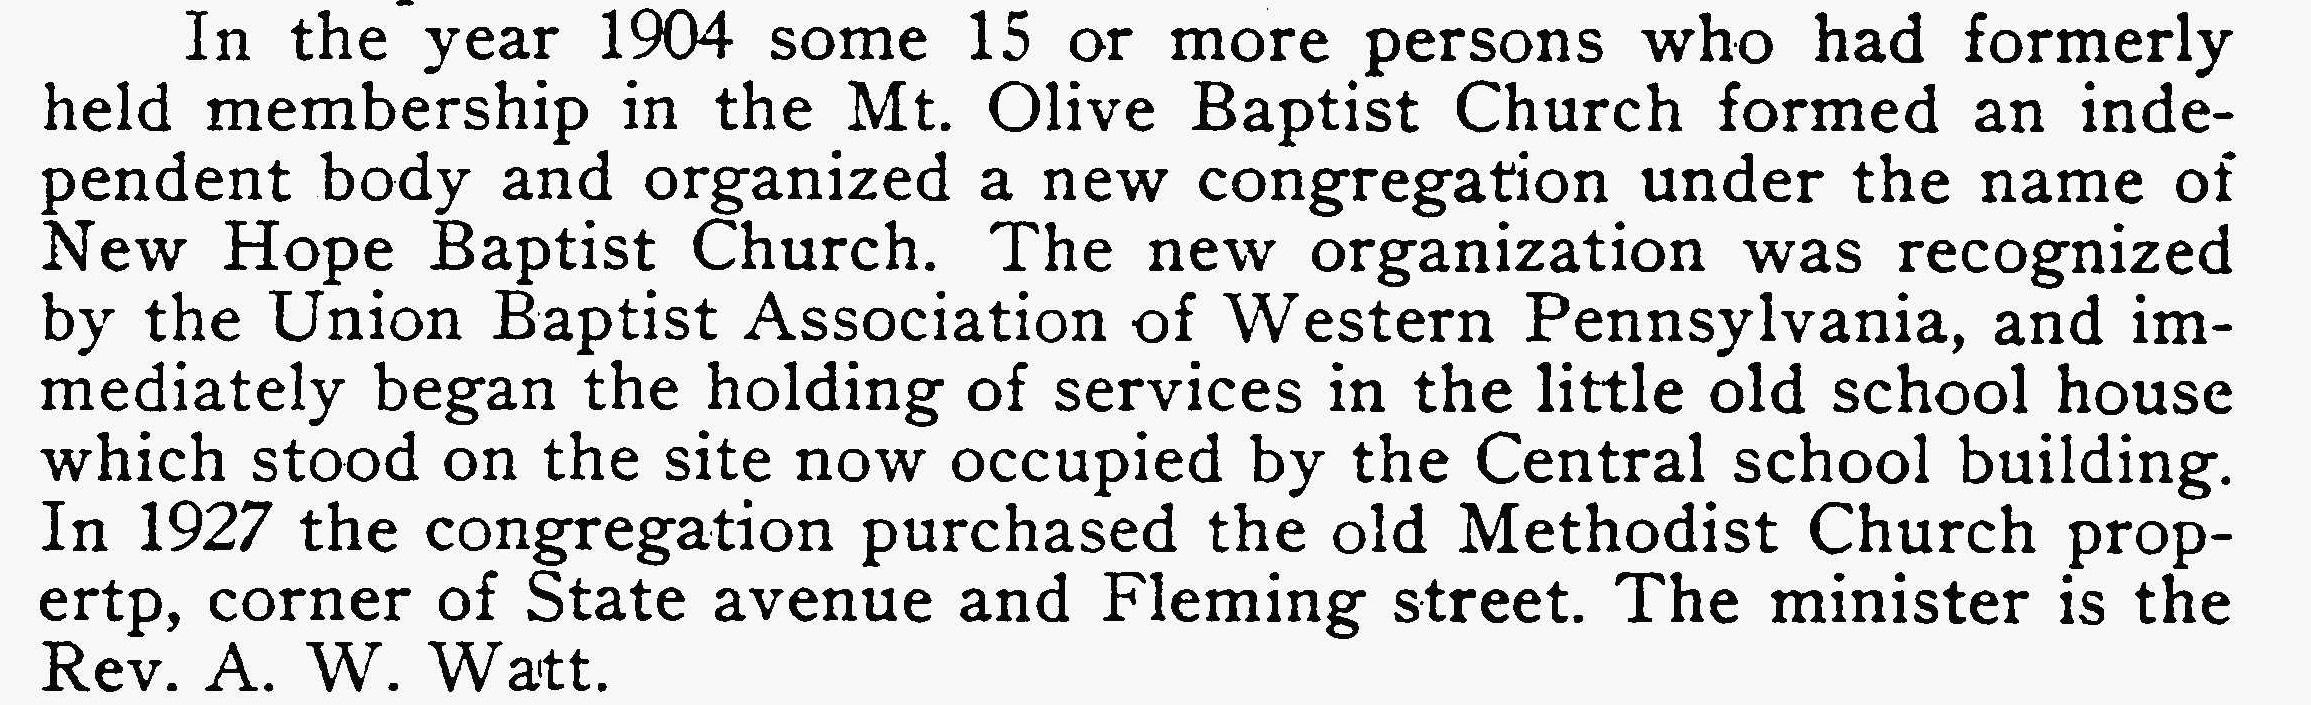 New Hope Baptist Church - Edward S Maurey - Where the West Began (pg66).jpg